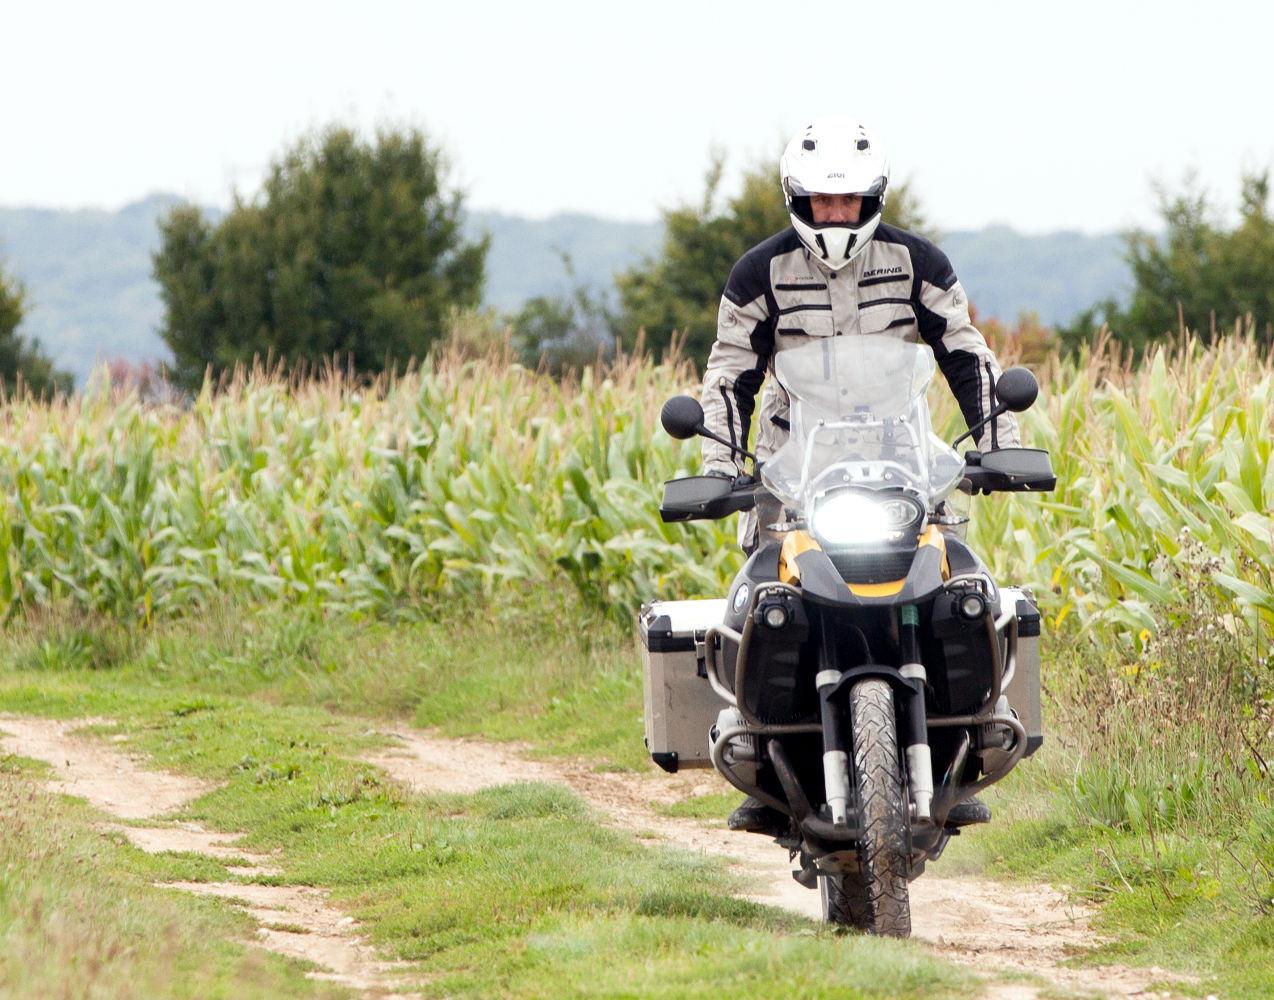 Imagen test Scorpion trail